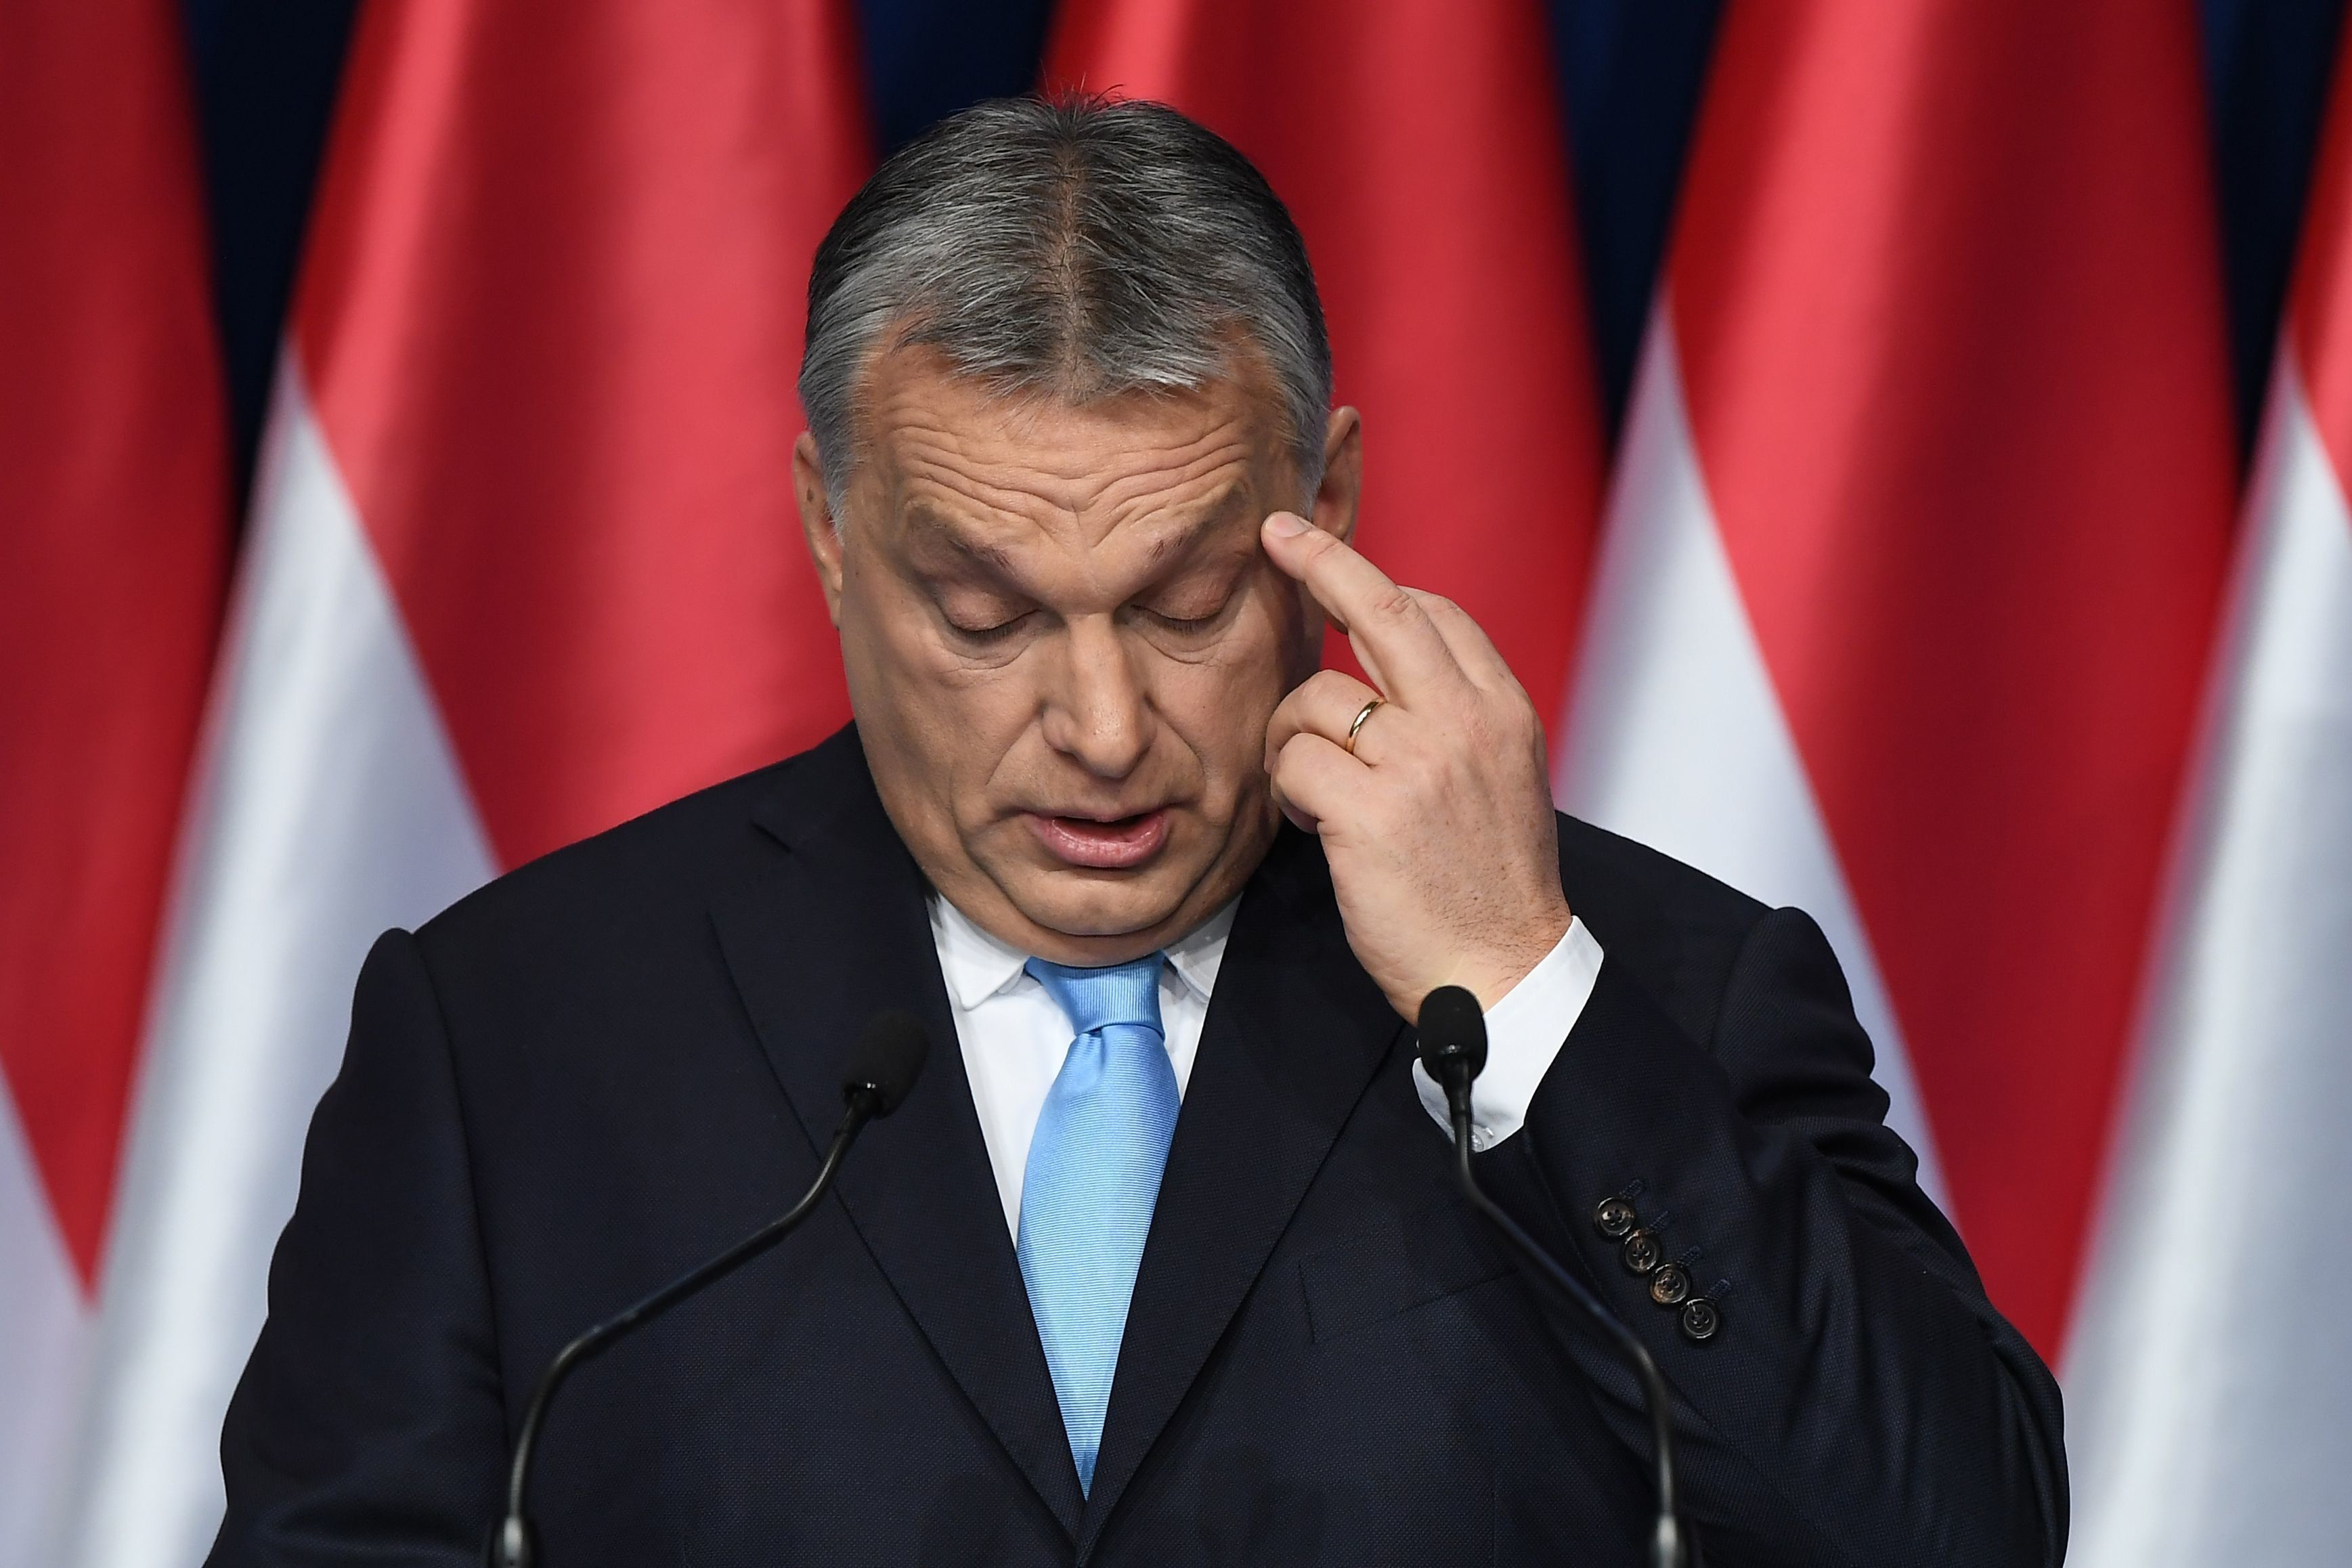 Orban droht der Ausschluss aus der EVP: